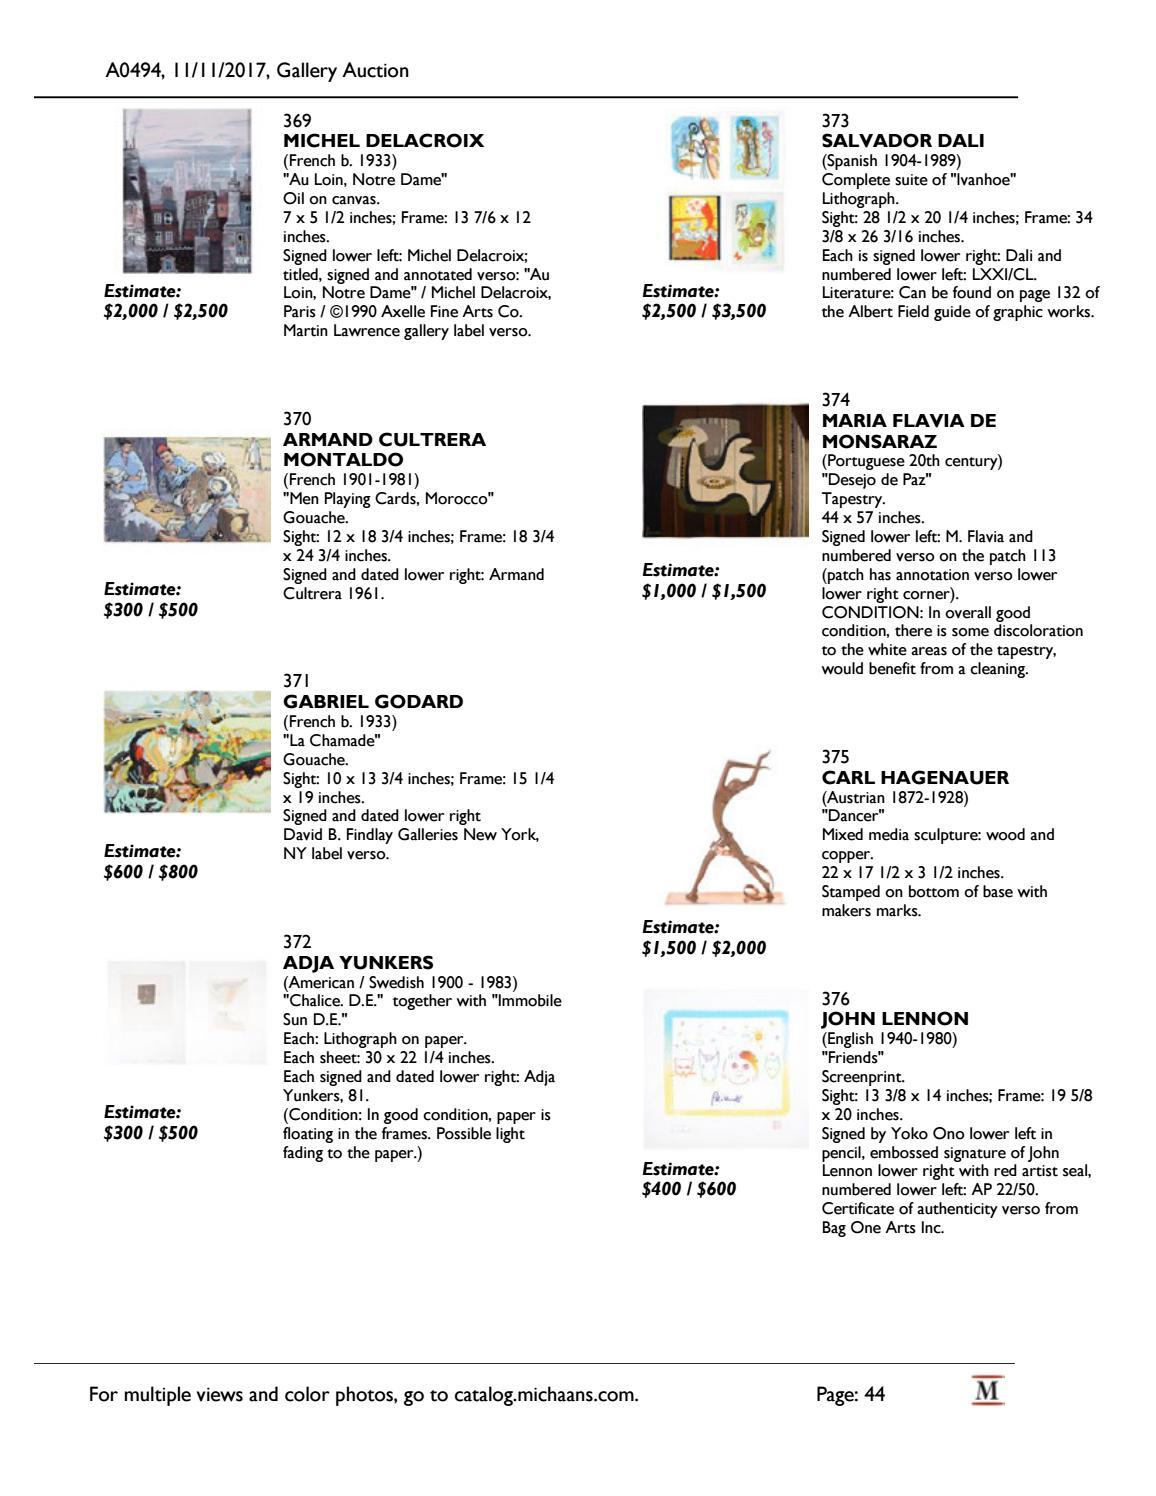 November Gallery Auction catalog